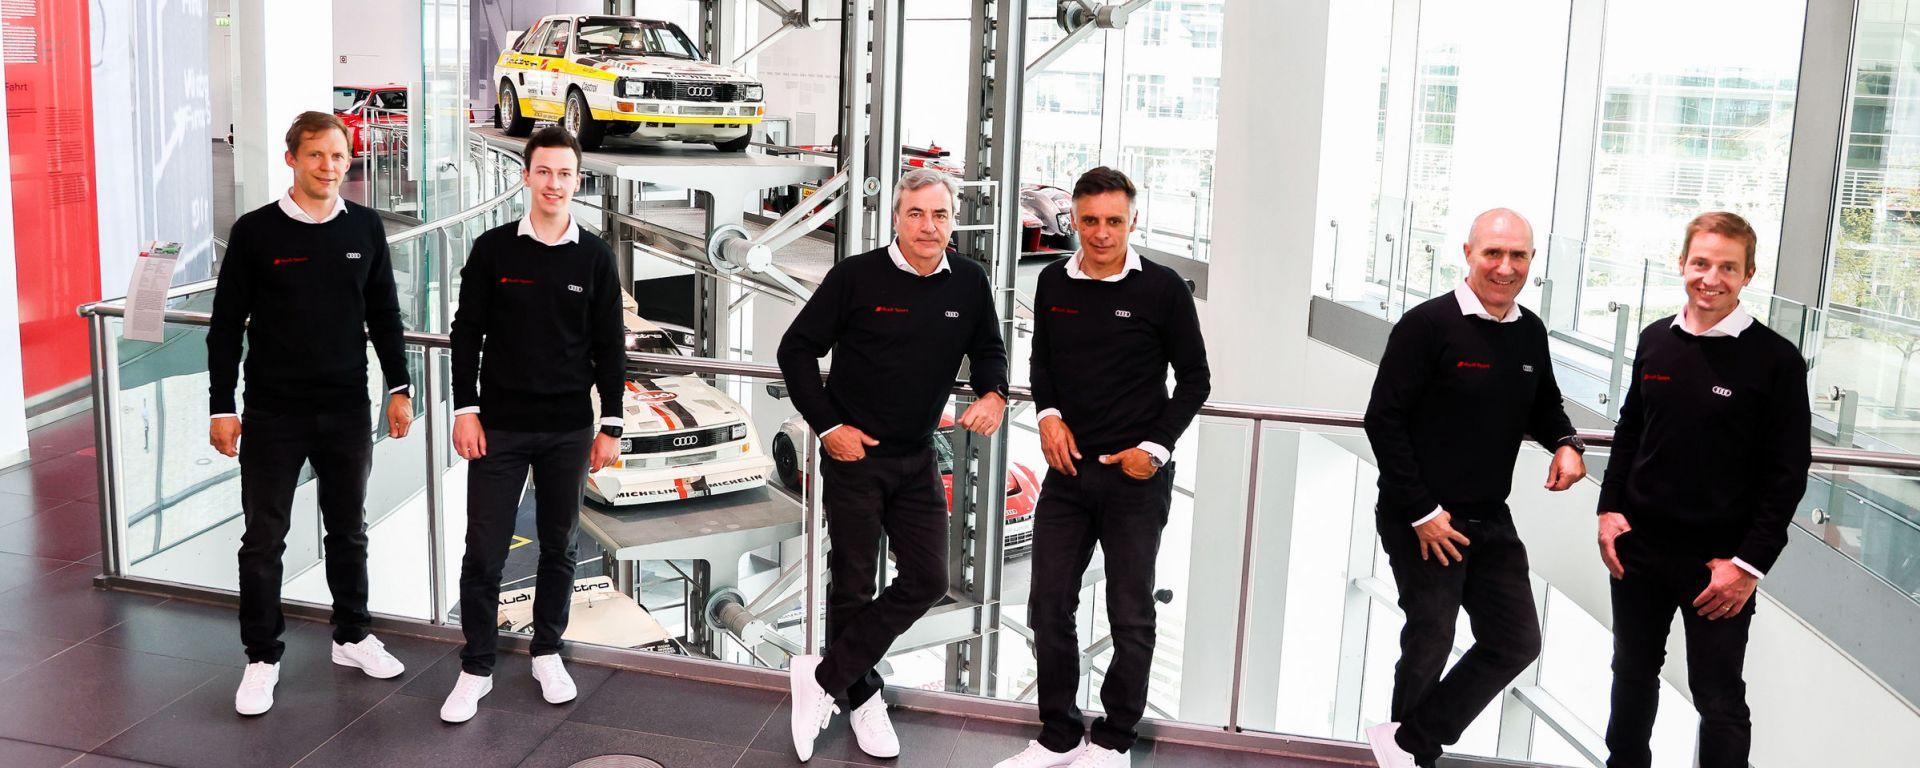 Audi presenta il suo Team Dakar 2022: Mattias Ekström, Emil Bergkvist, Carlos Sainz, Lucas Cruz, Stéphane Peterhansel, Edouard B